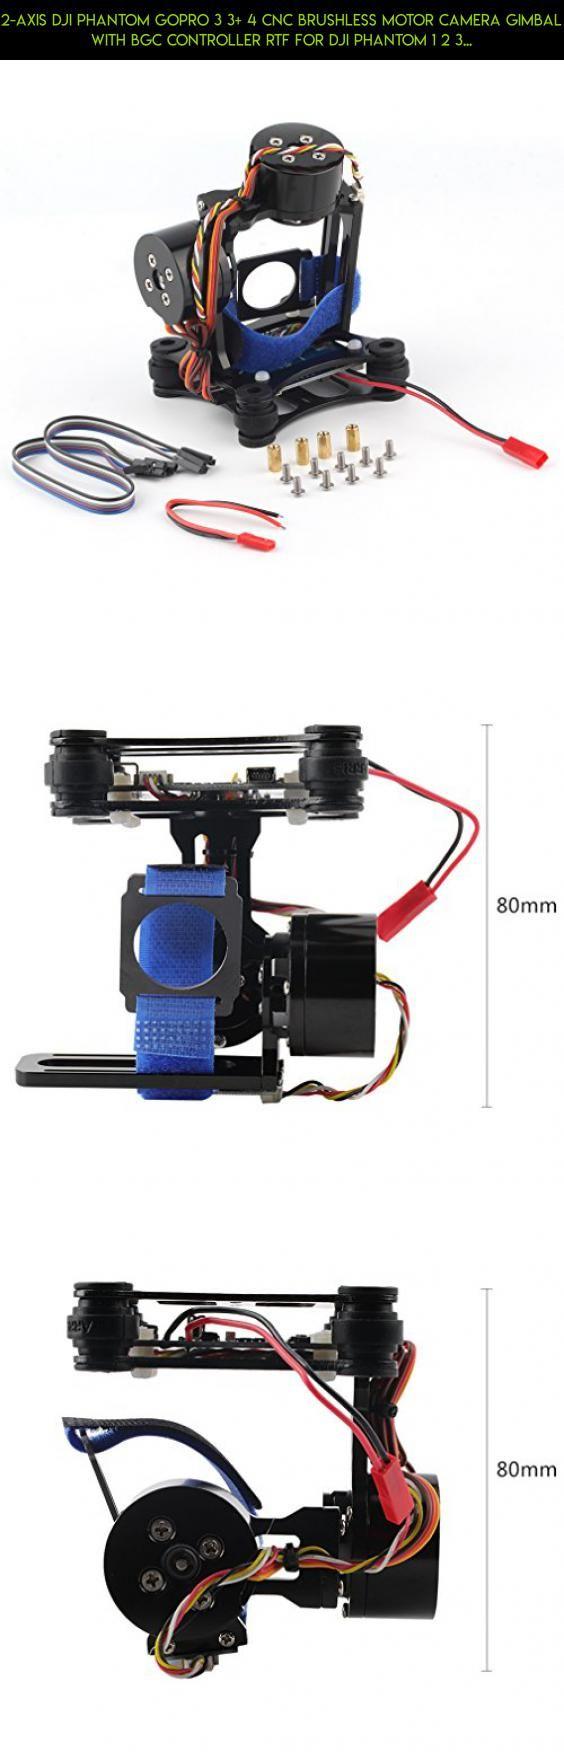 2-Axis DJI Phantom Gopro 3 3+ 4 CNC Brushless Motor Camera Gimbal with BGC Controller RTF for DJI Phantom 1 2 3 GoPro Hero3+ Hero3 FPV - Black #products #tech #camera #phantom #plans #standard #dji #gimbal #technology #kit #gadgets #shopping #racing #drone #parts #3 #fpv #motor